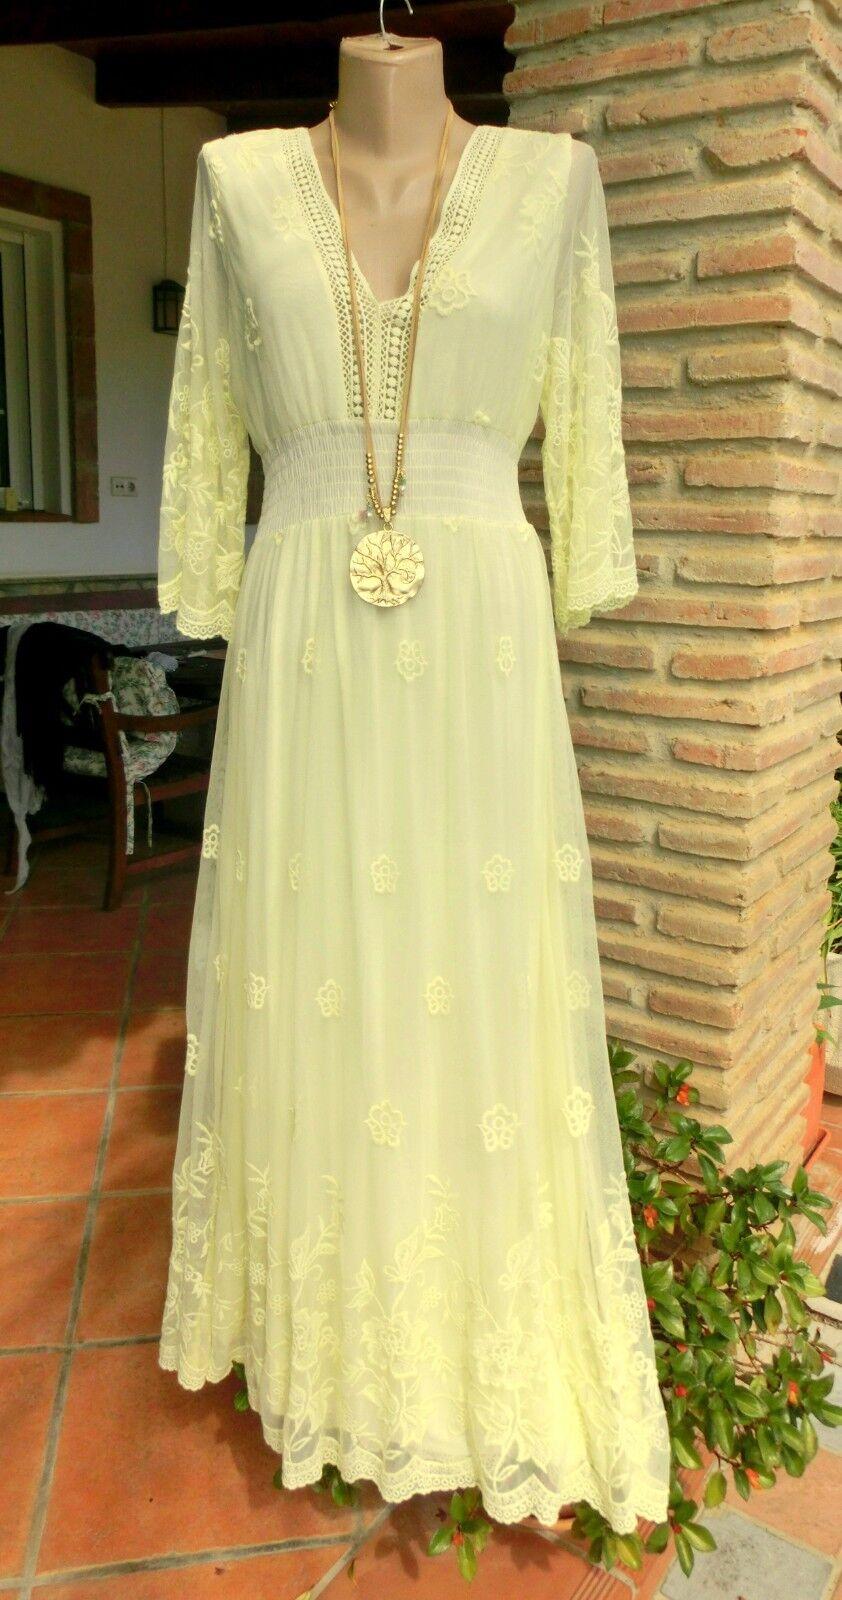 Maxi vestido punta Elisa forraje tul romance viscosa viscosa viscosa vainilla CE 36-42 22f11c